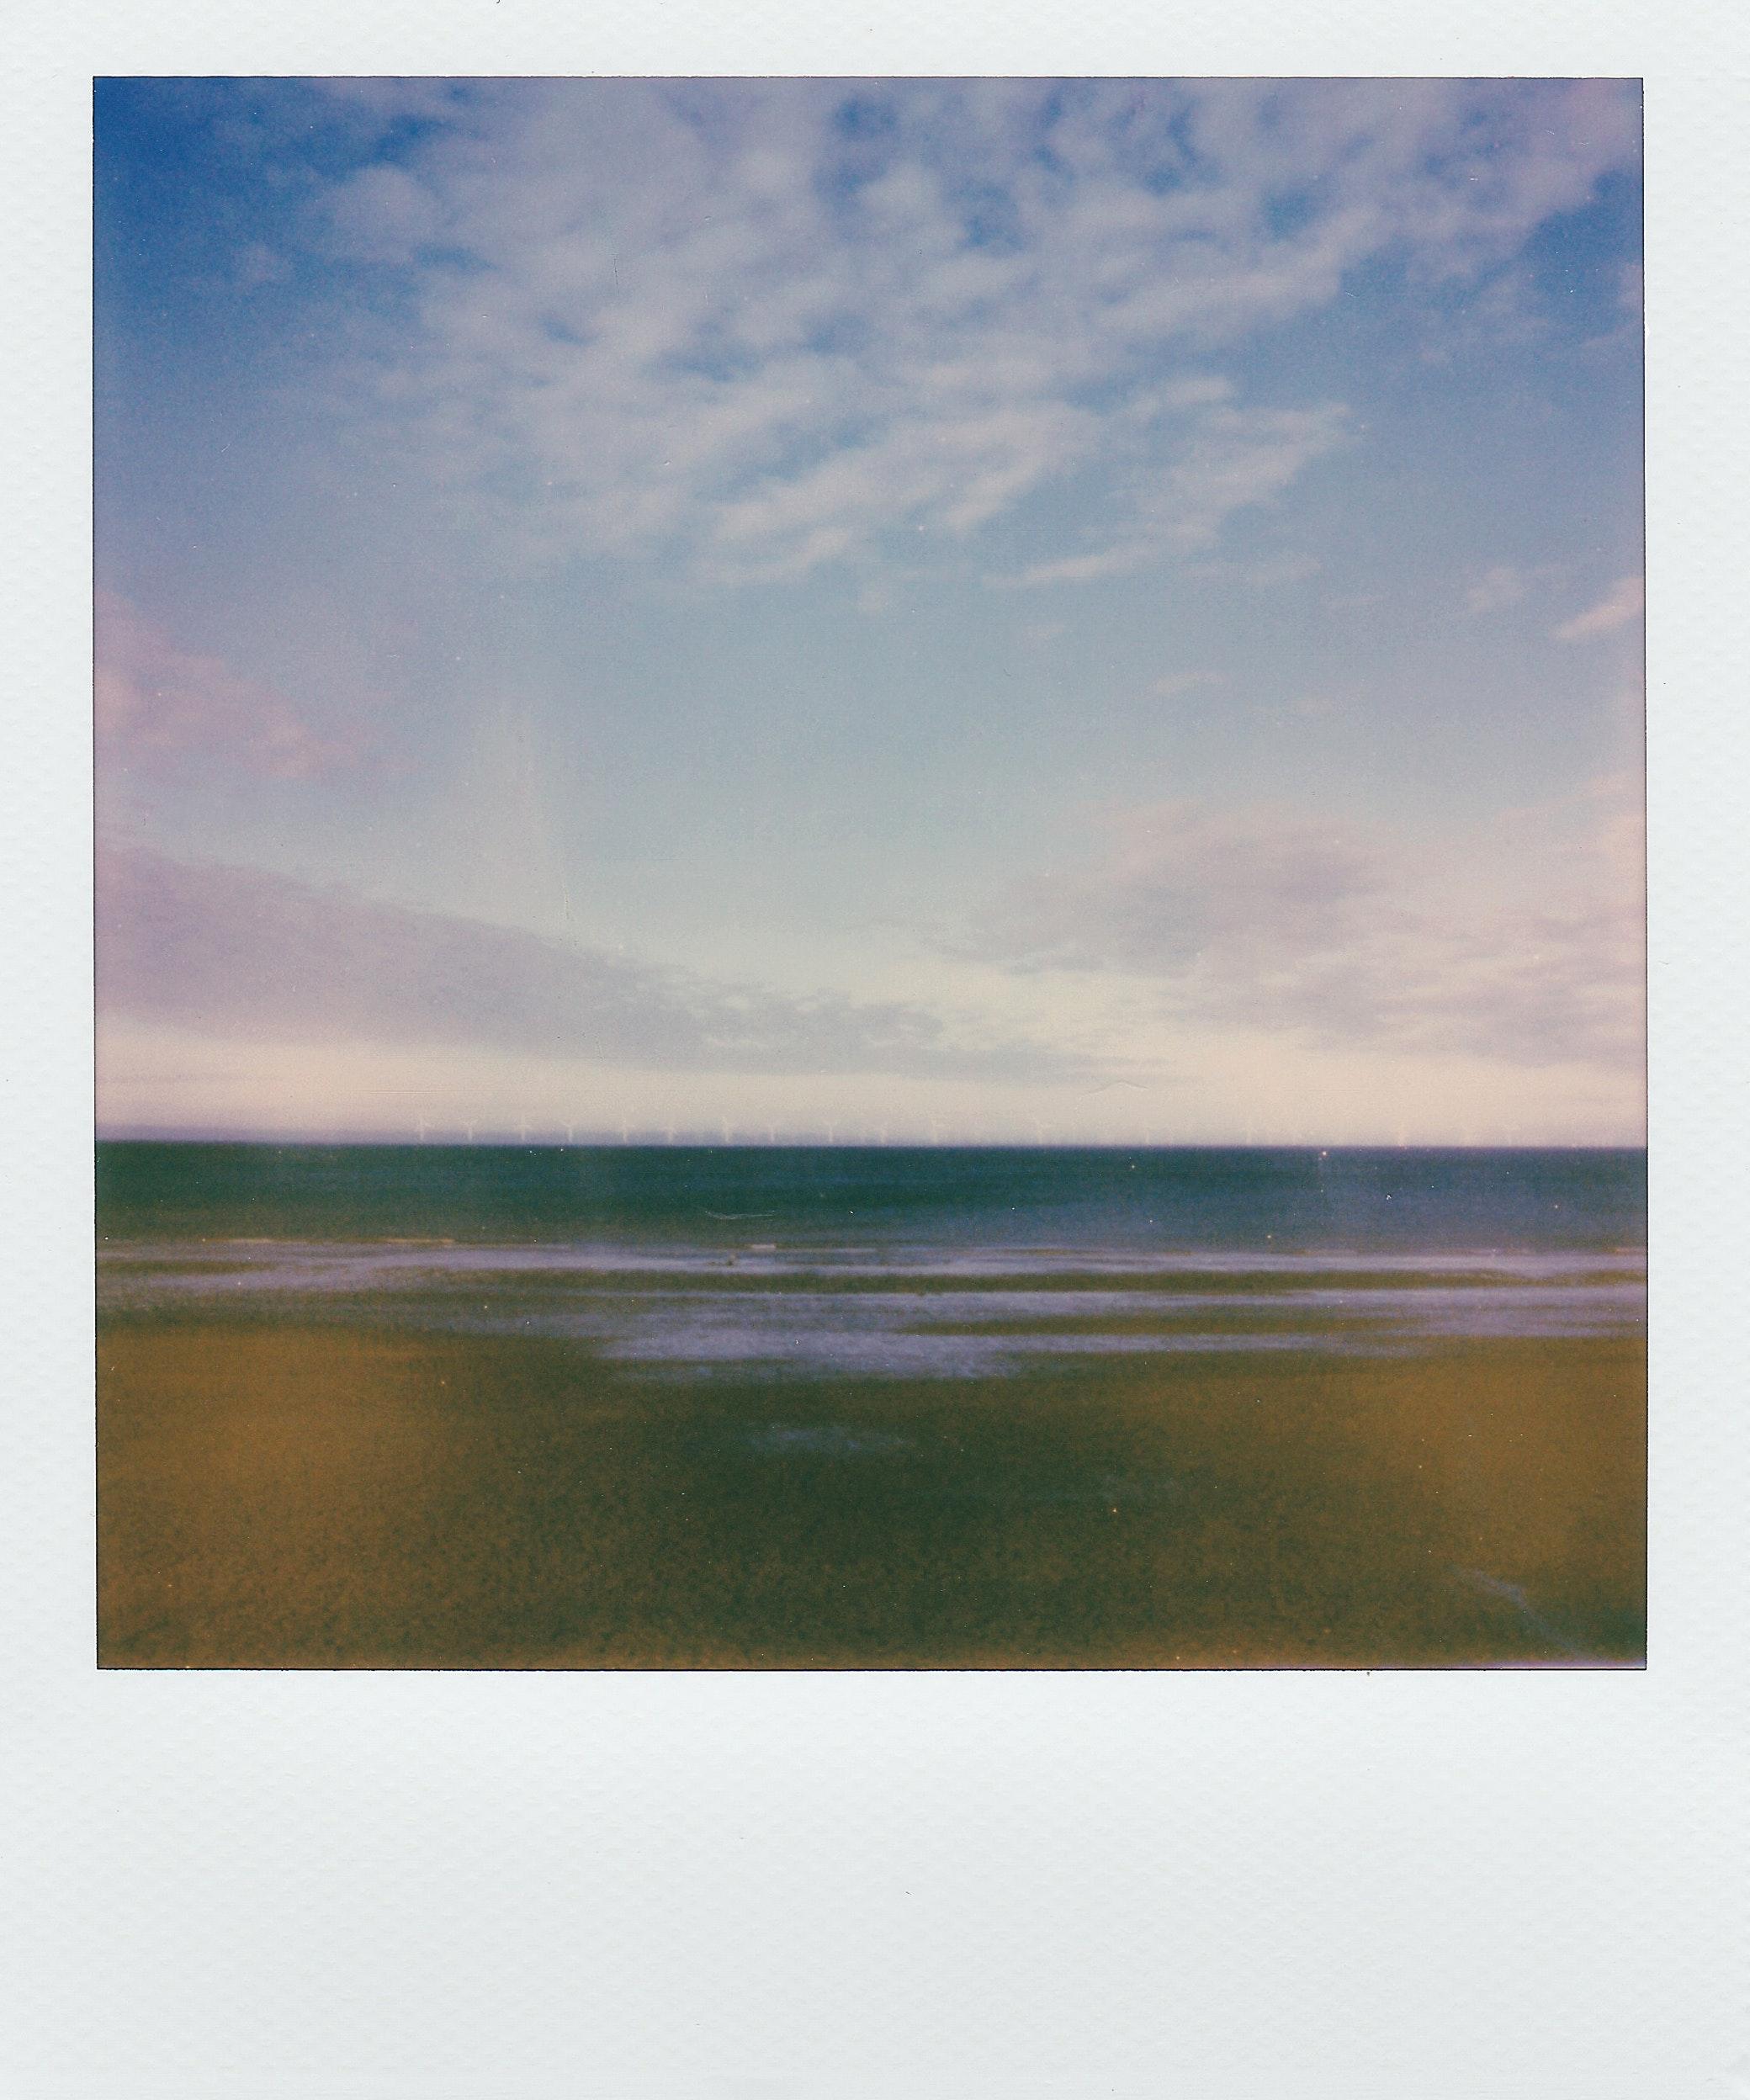 beach-clouds-daylight-2043013.jpg